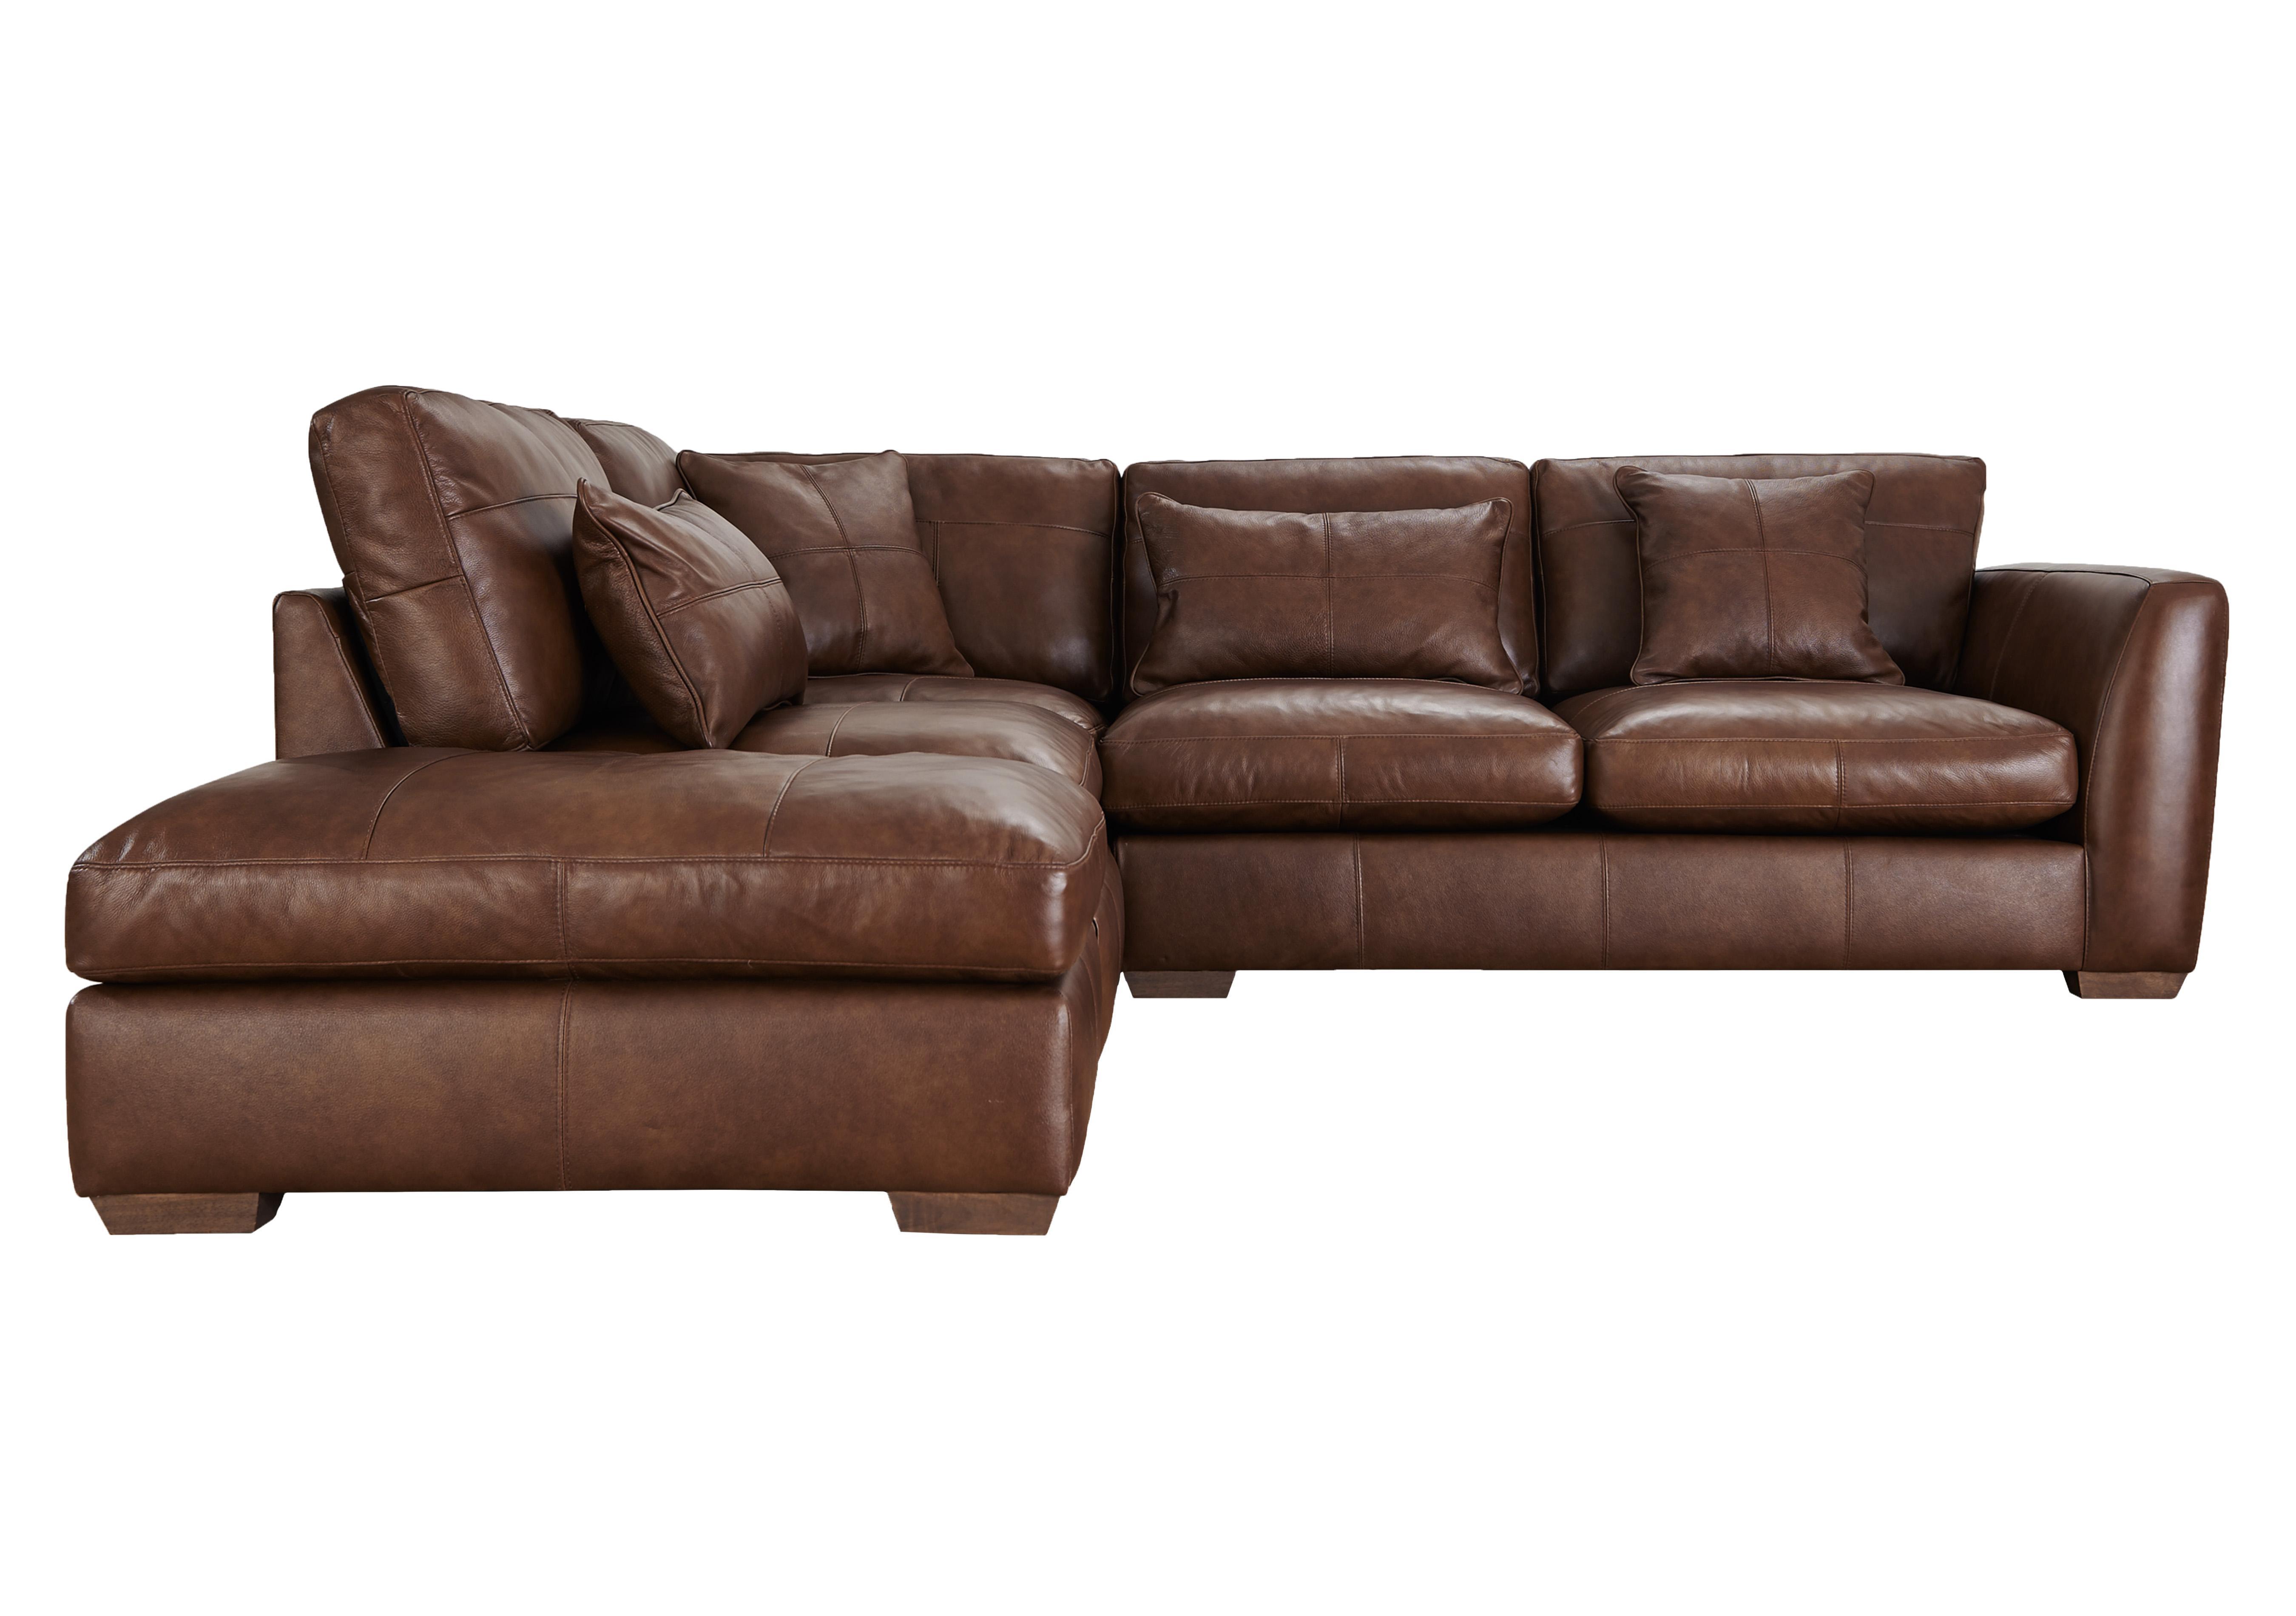 savannah leather corner sofa - furniture village NSBSTXF